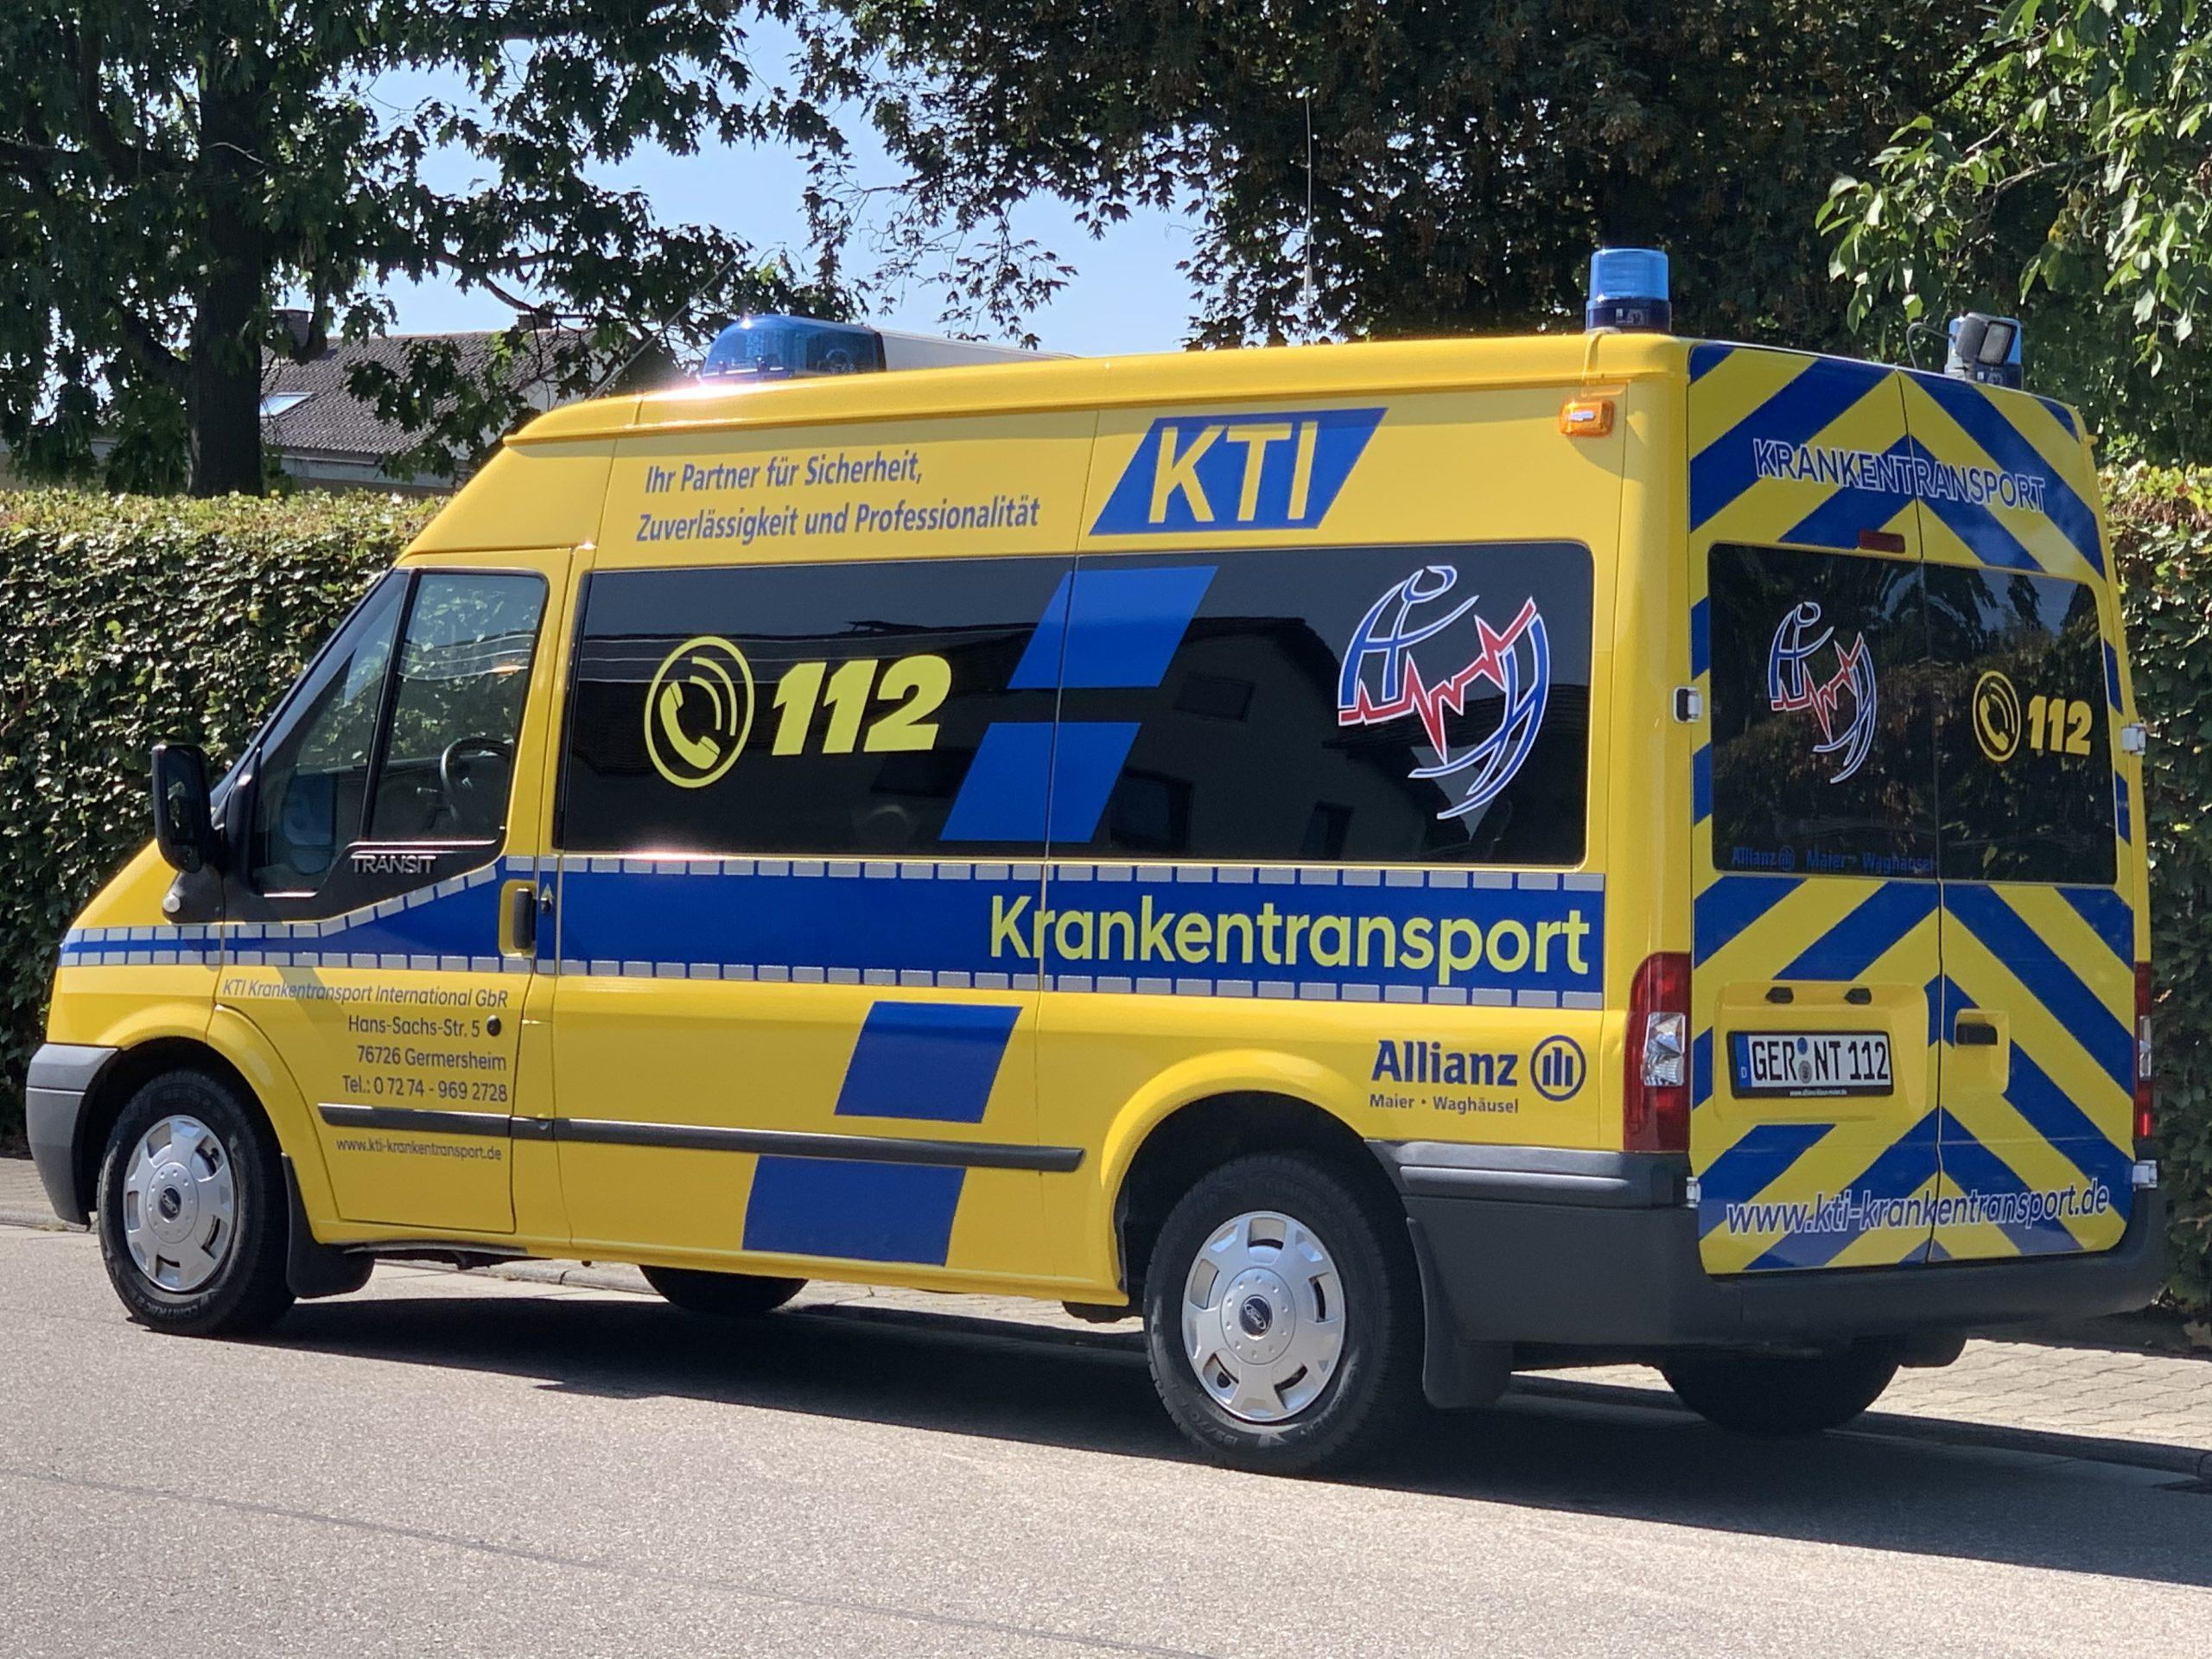 KTI-Krankentransport International